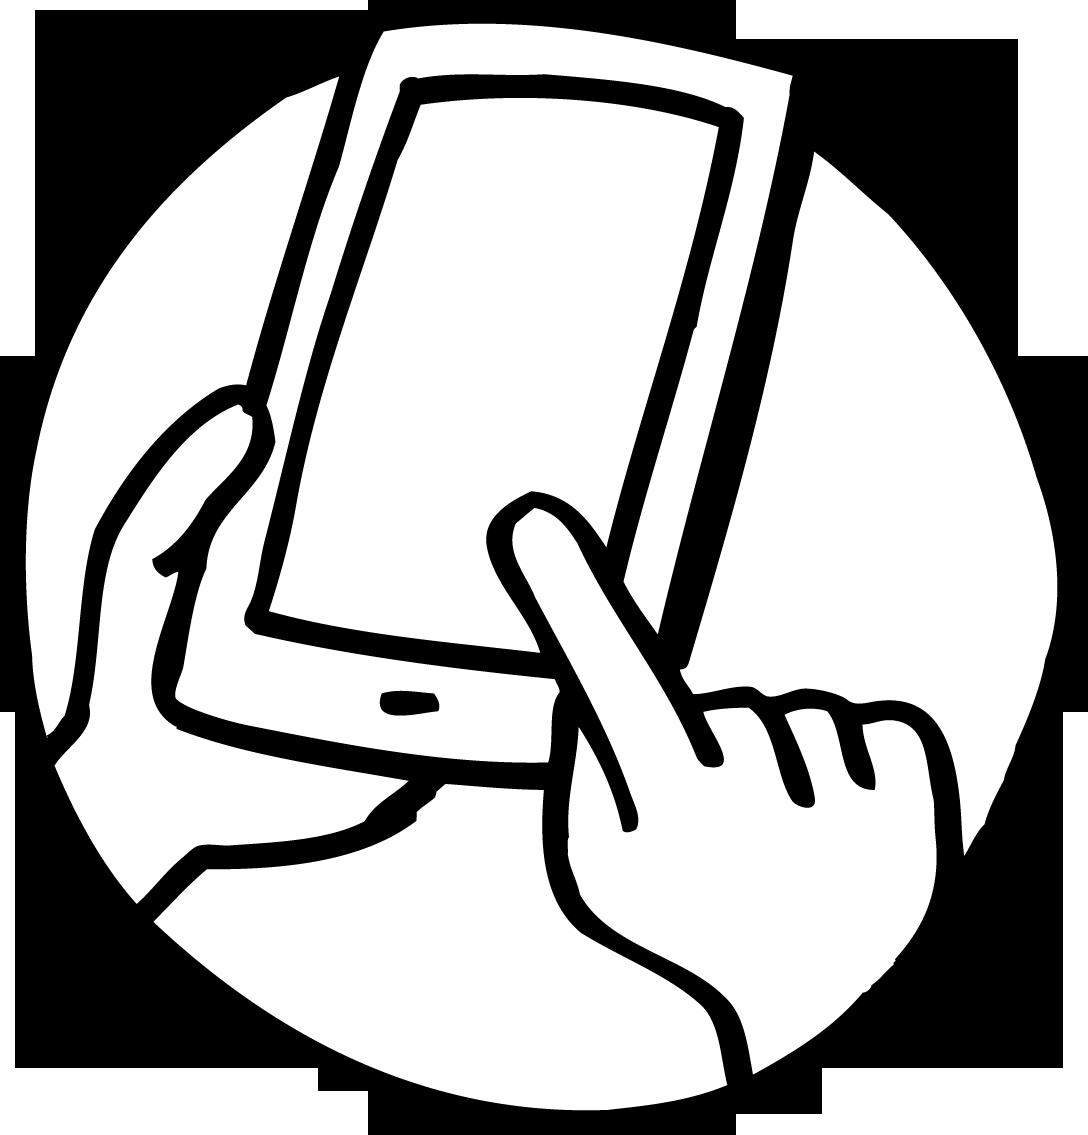 jpg stock Telephone Line Drawing at GetDrawings